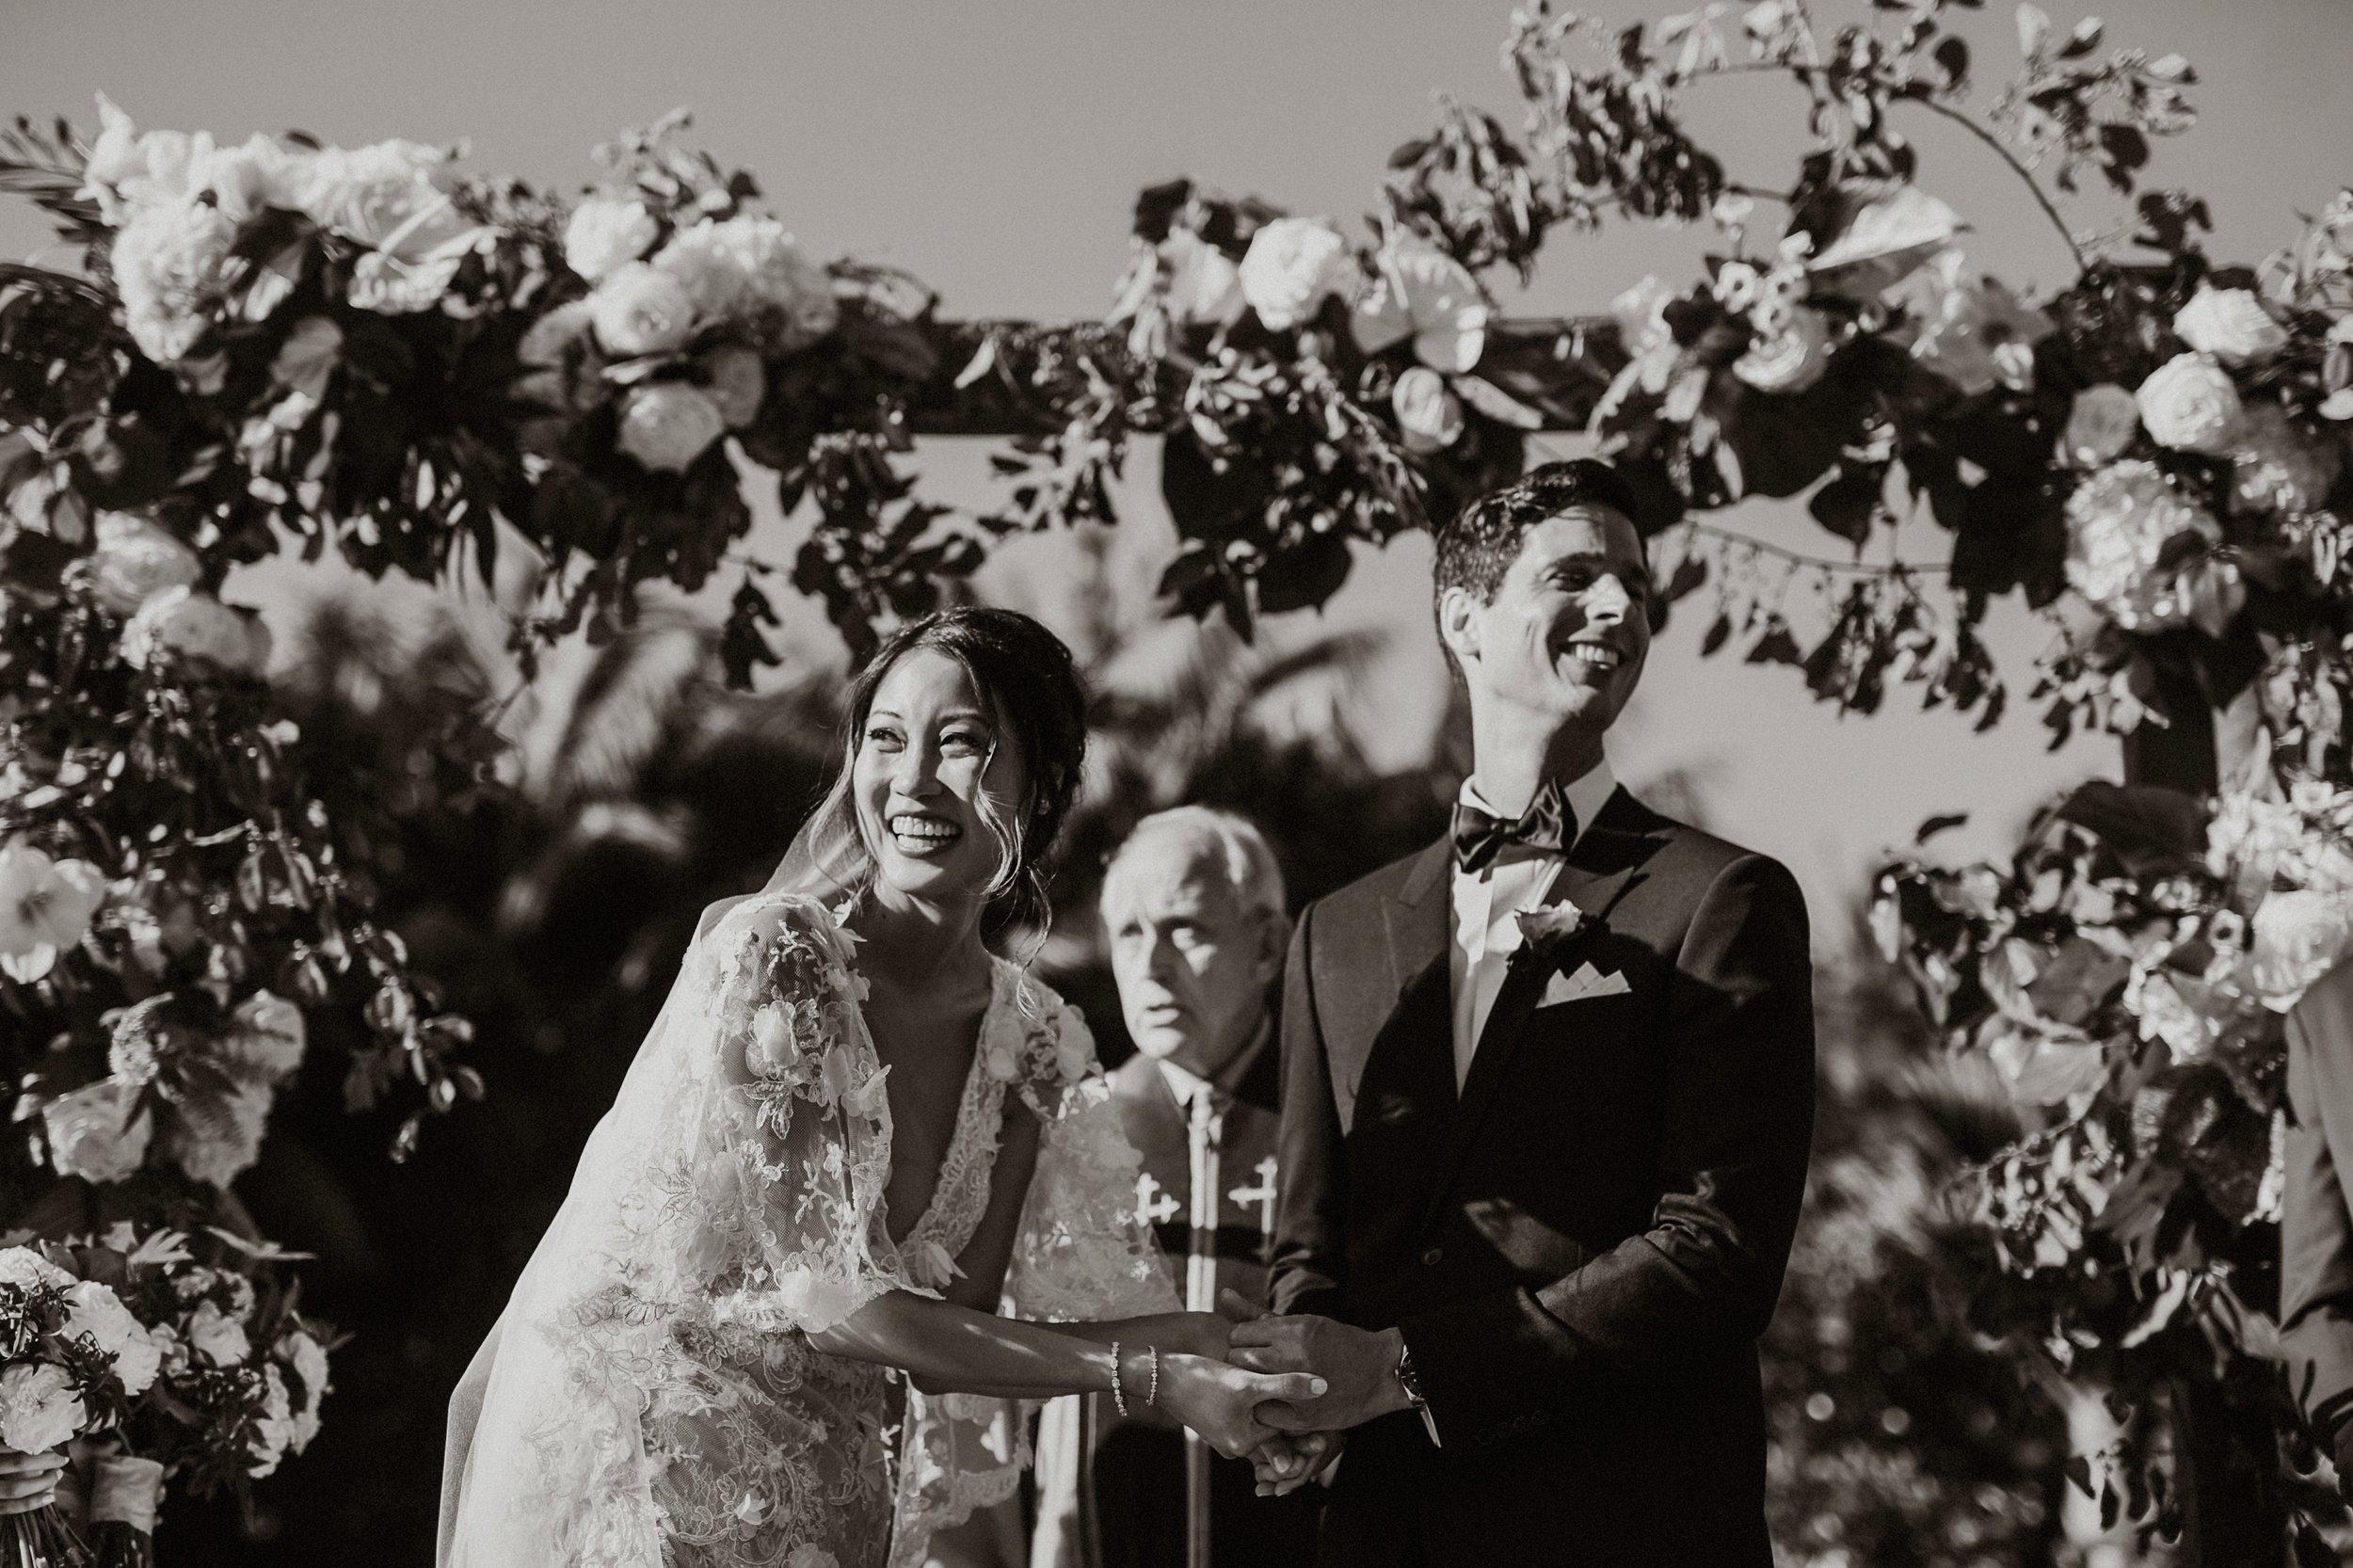 www.santabarbarawedding.com | Event of the Season | Gina and Ryan Photo | Four Seasons | Ceremony | Bride and Groom